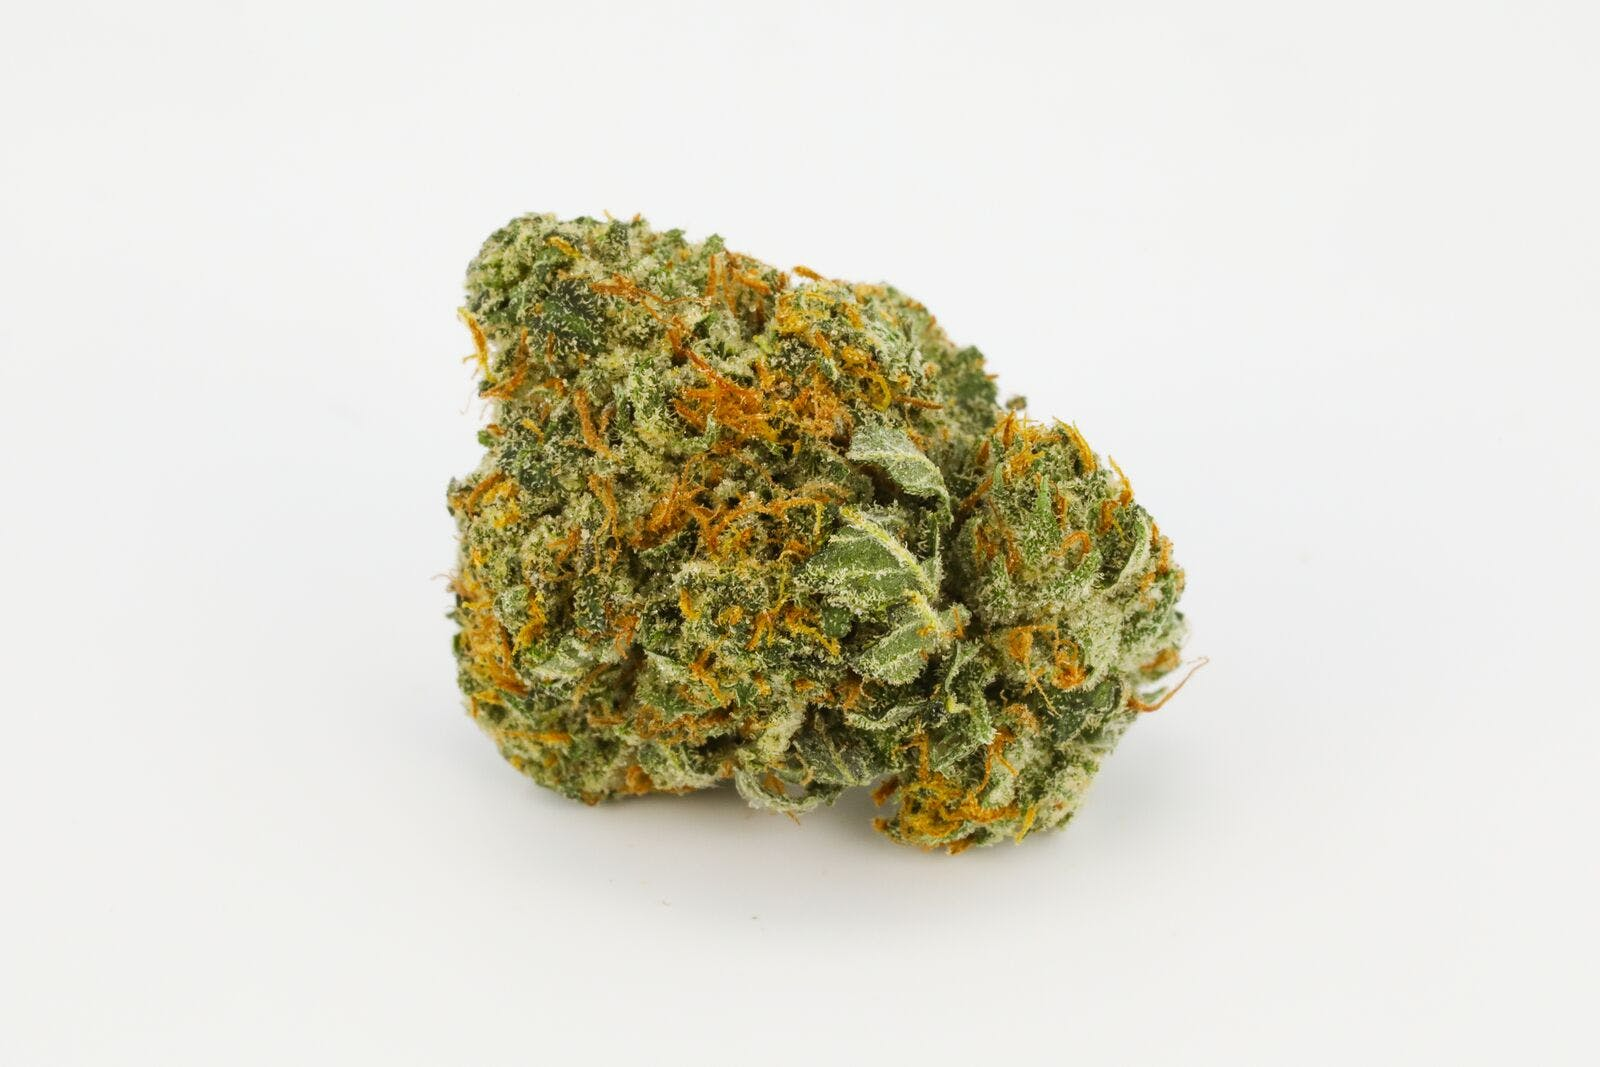 King's Kush Weed; King's Kush Cannabis Strain; King's Kush Indica Marijuana Strain